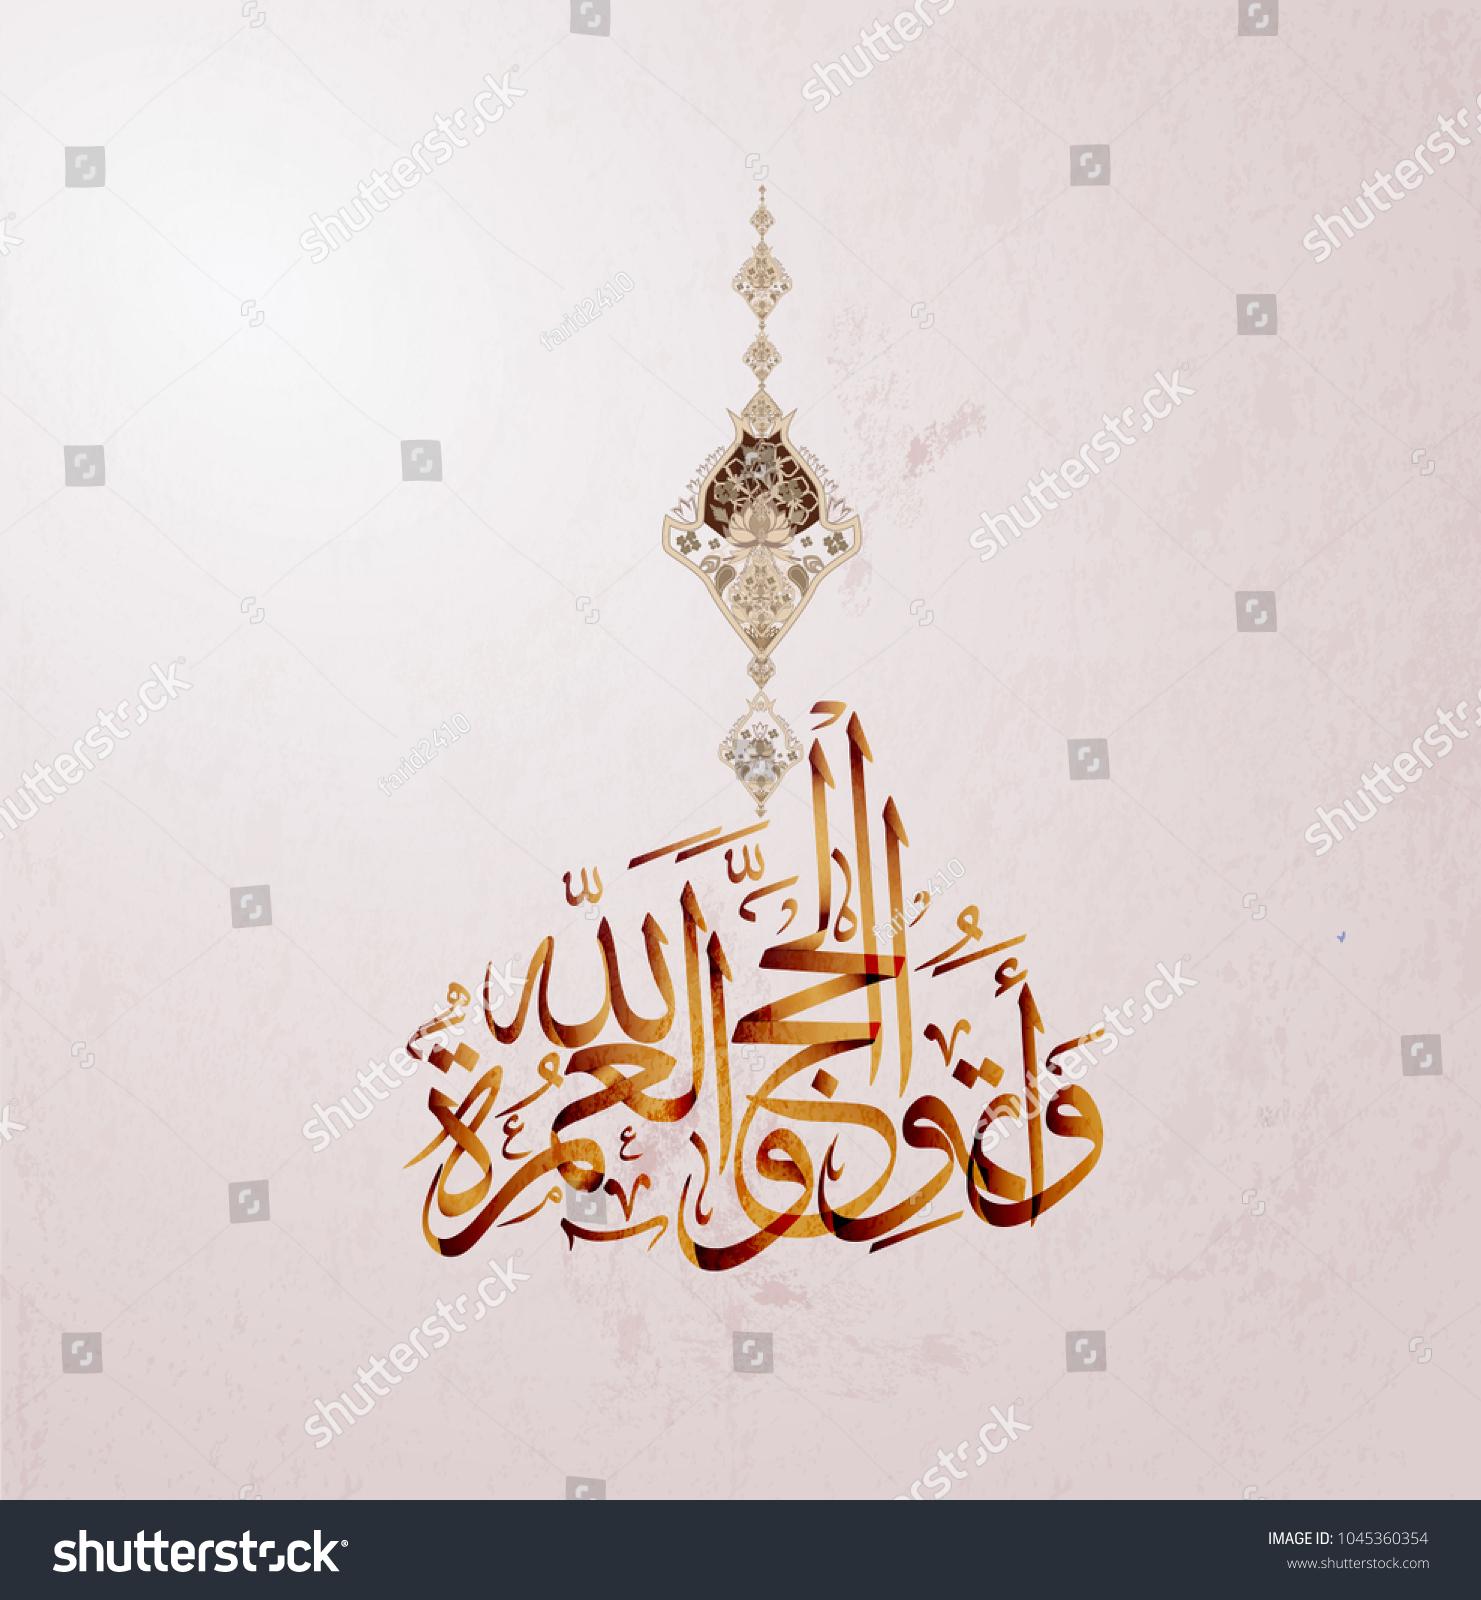 Hajj umrah greeting arabic calligraphy art stock vector 1045360354 hajj and umrah greeting in arabic calligraphy art spelled as hajj mabrour and kristyandbryce Choice Image